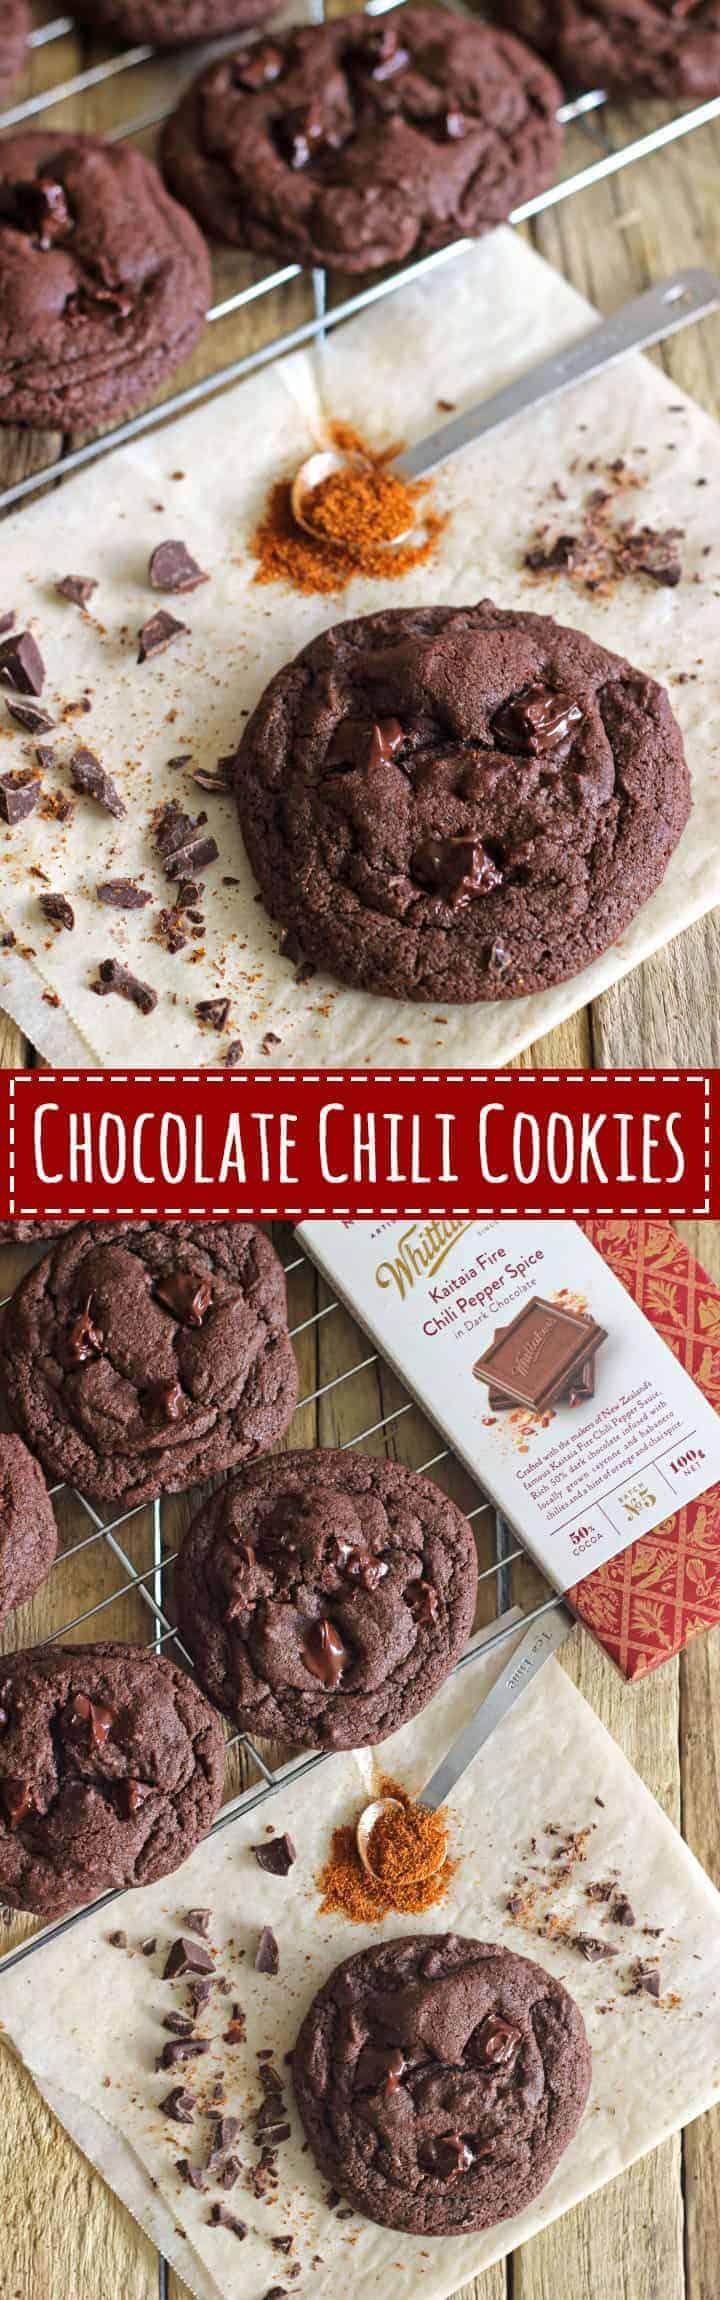 Chocolate Chili Cookies - The Kiwi Country Girl